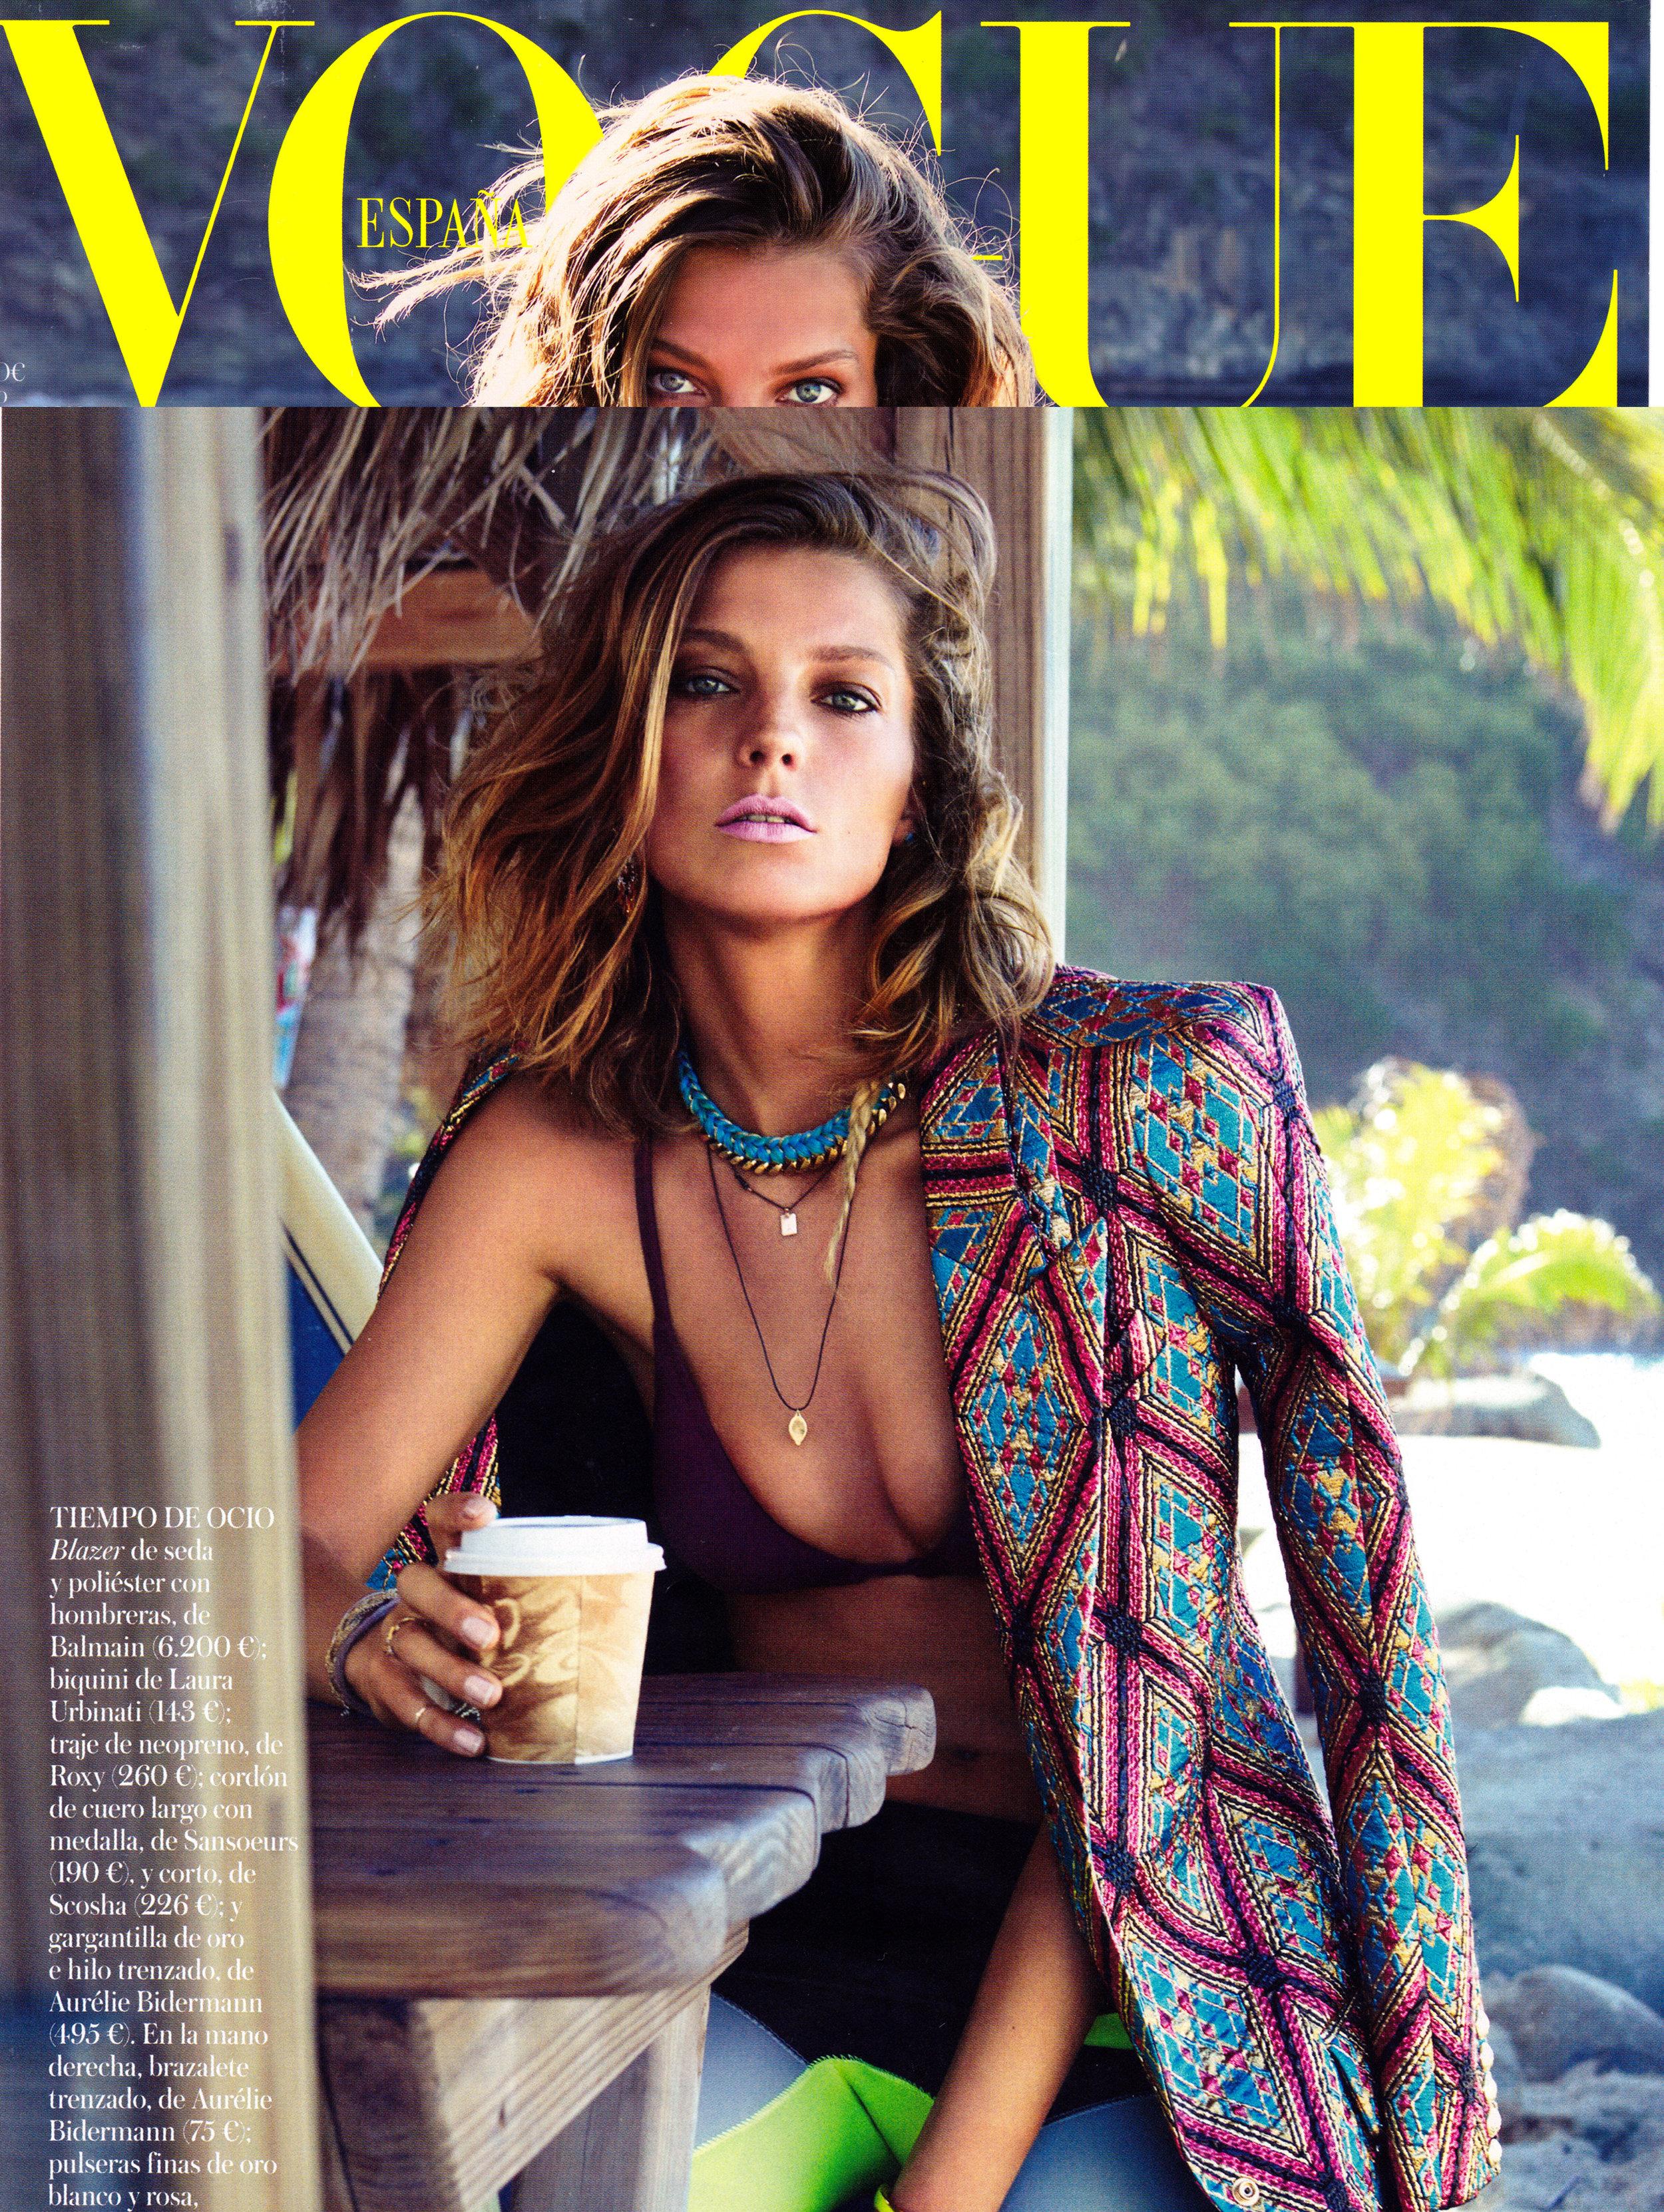 Daria Werbowy - Vogue Spain 2013